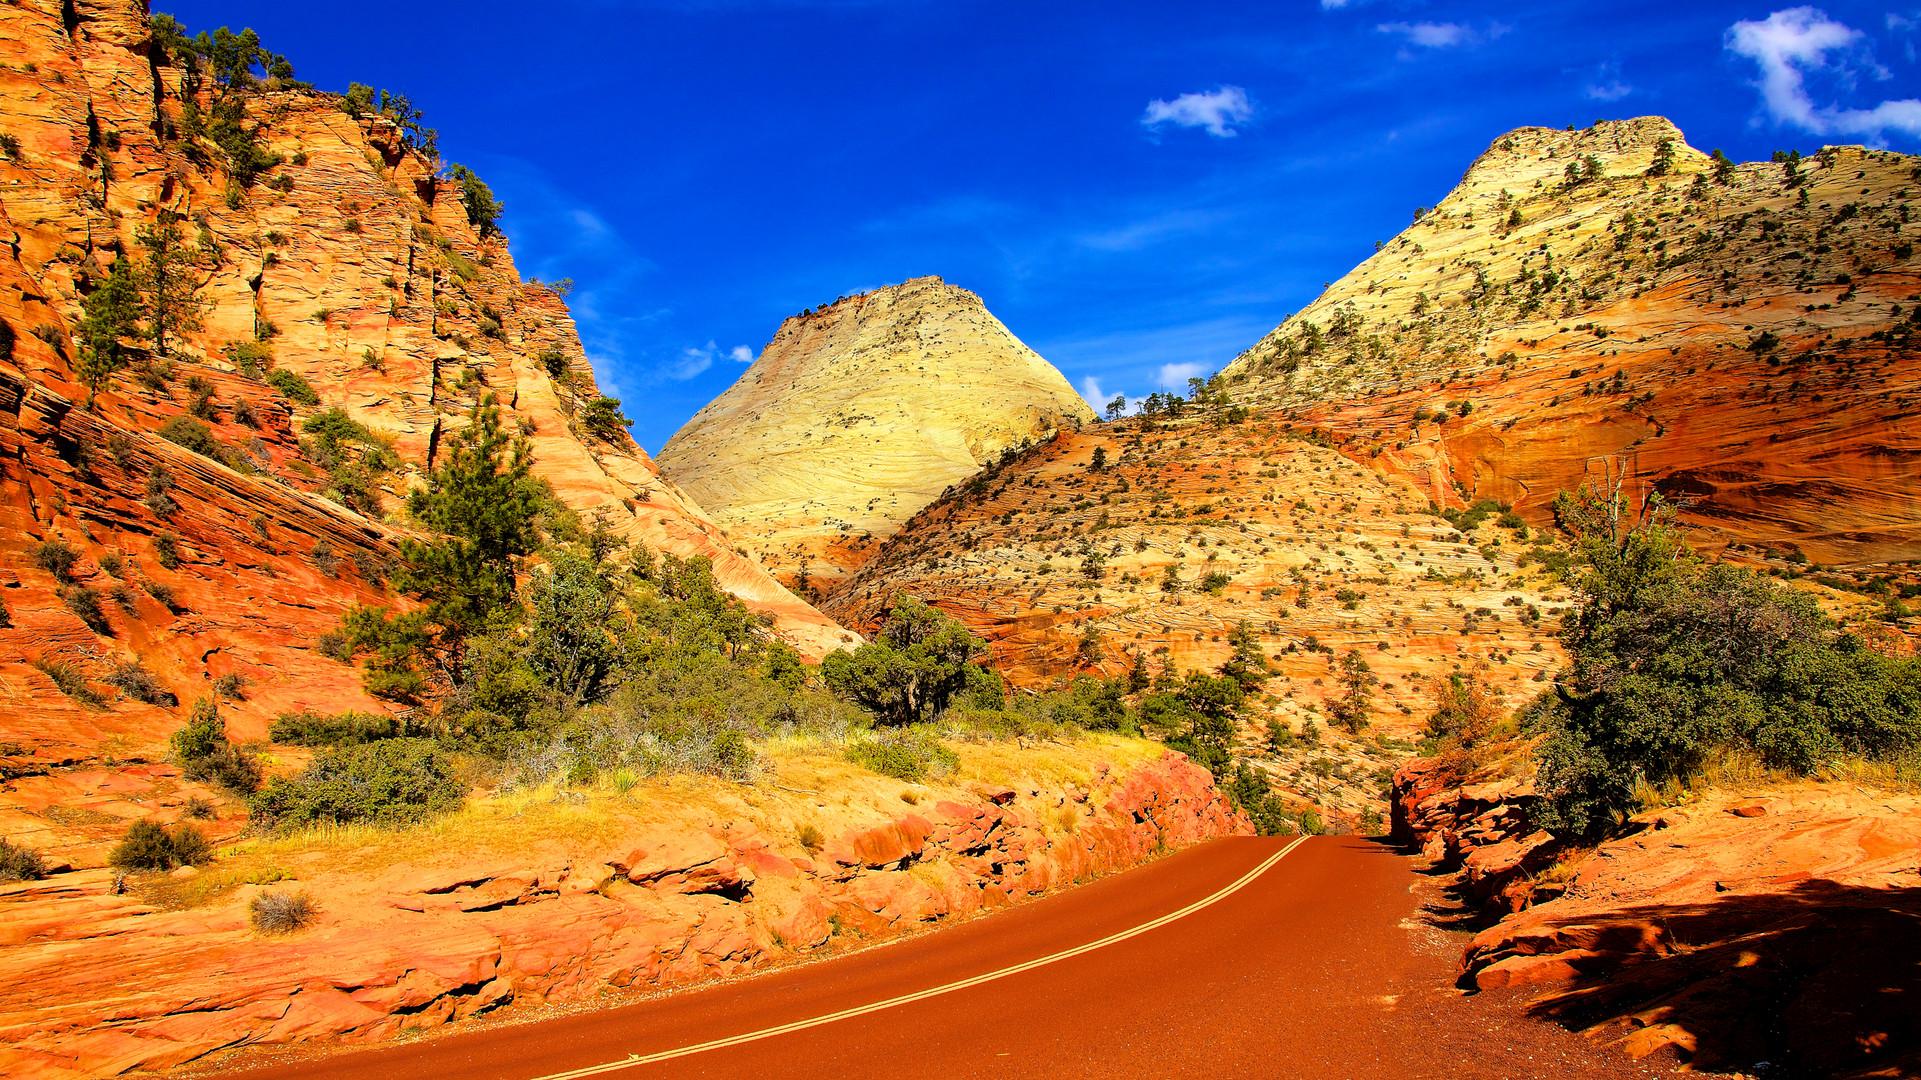 Roadscene at Zion